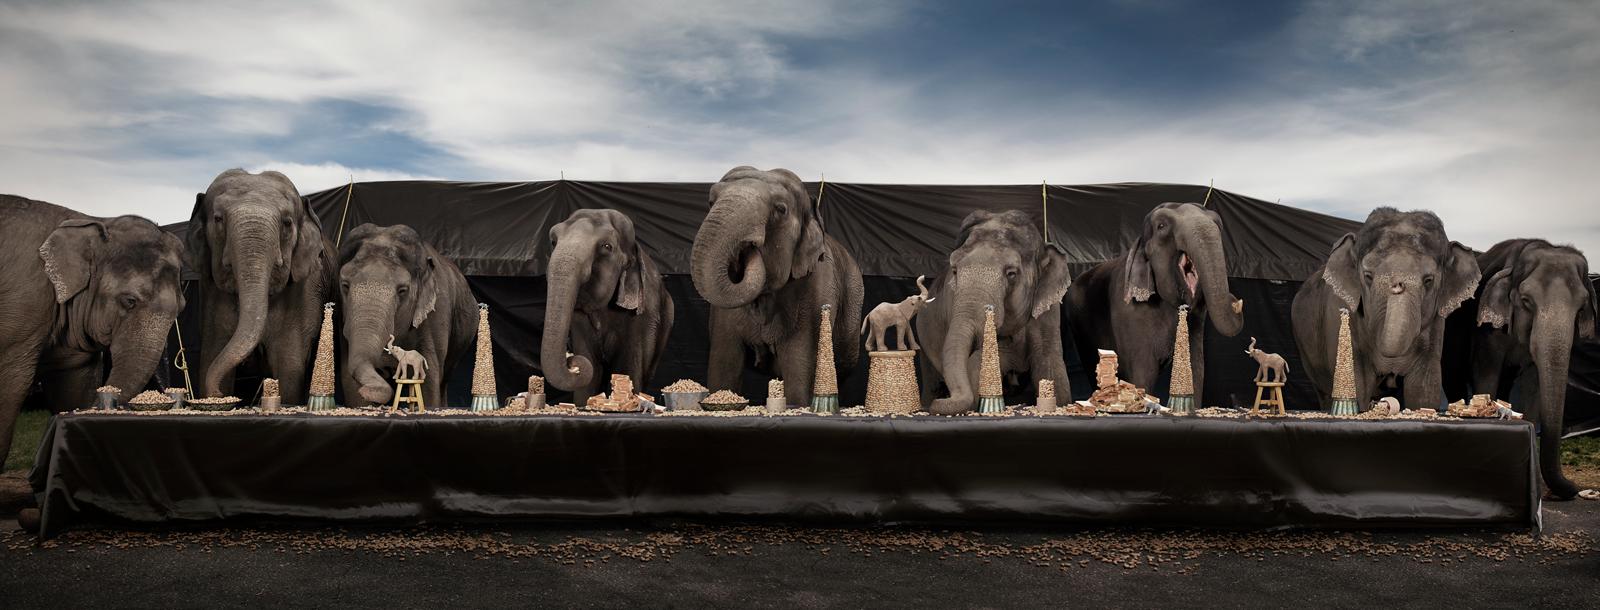 "The Elephant Feast  United States, 2013  10""x26"" | 20""x52"" | 40""x104"""